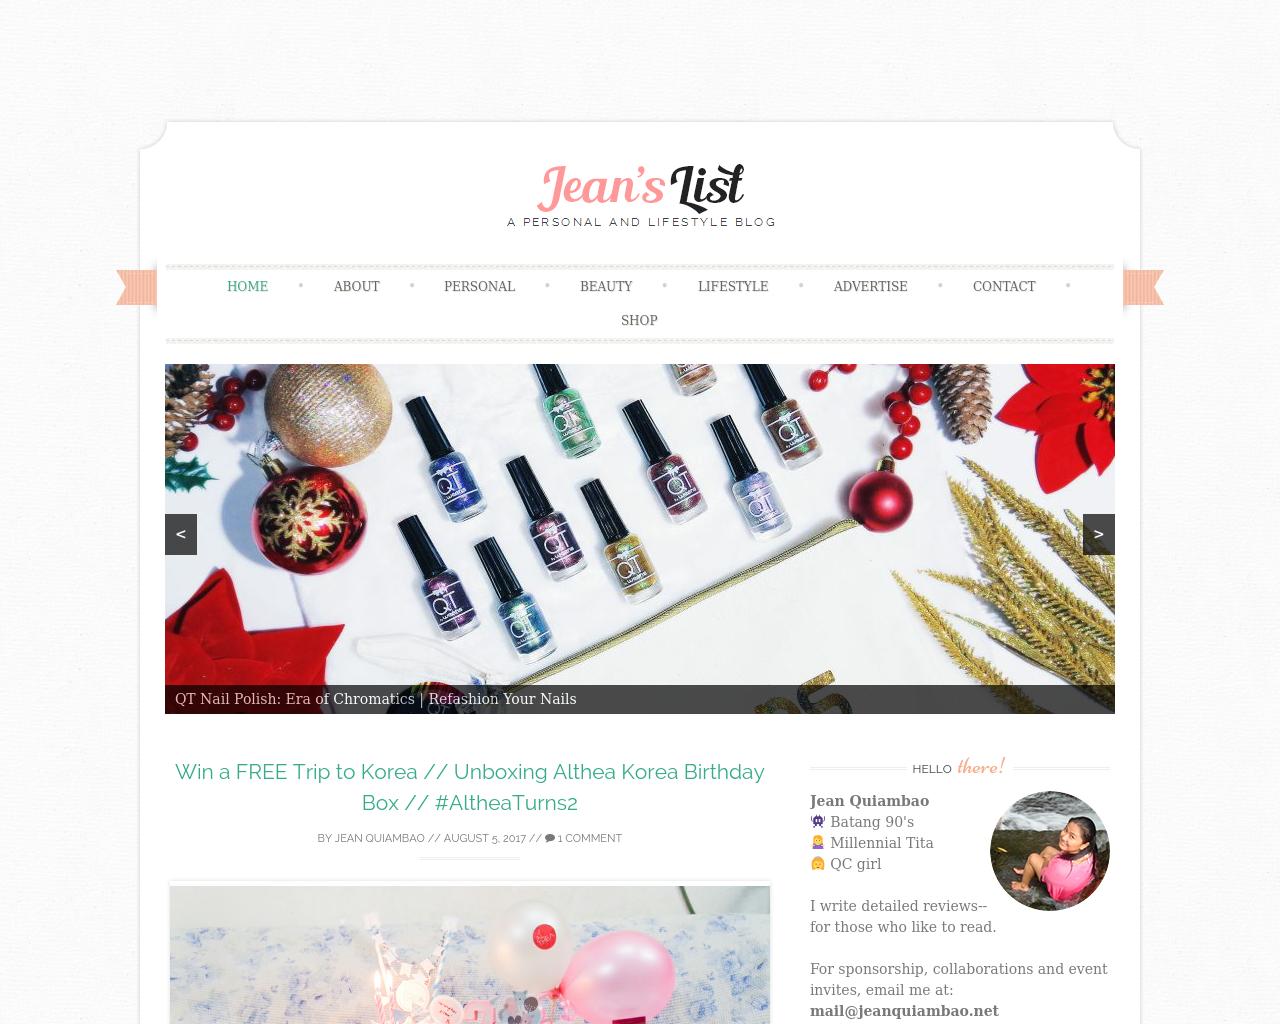 Jeanquiambao.net-Advertising-Reviews-Pricing